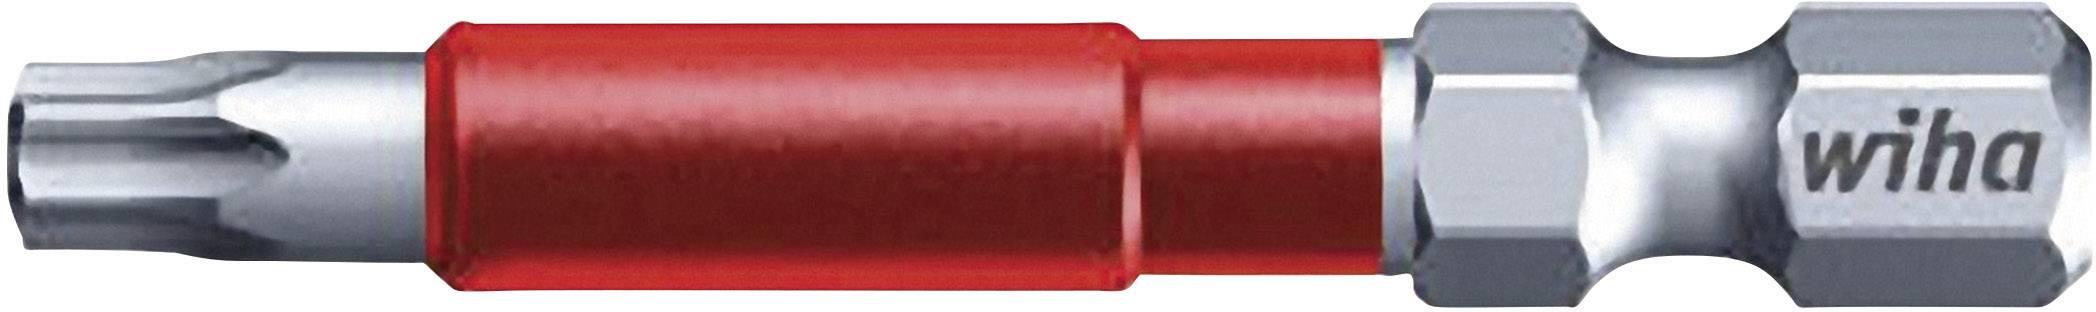 Bit Torx Wiha MaxxTor 7045 M9T 36839, 49 mm, nástrojová oceľ, legované, tvrdené, 5 ks